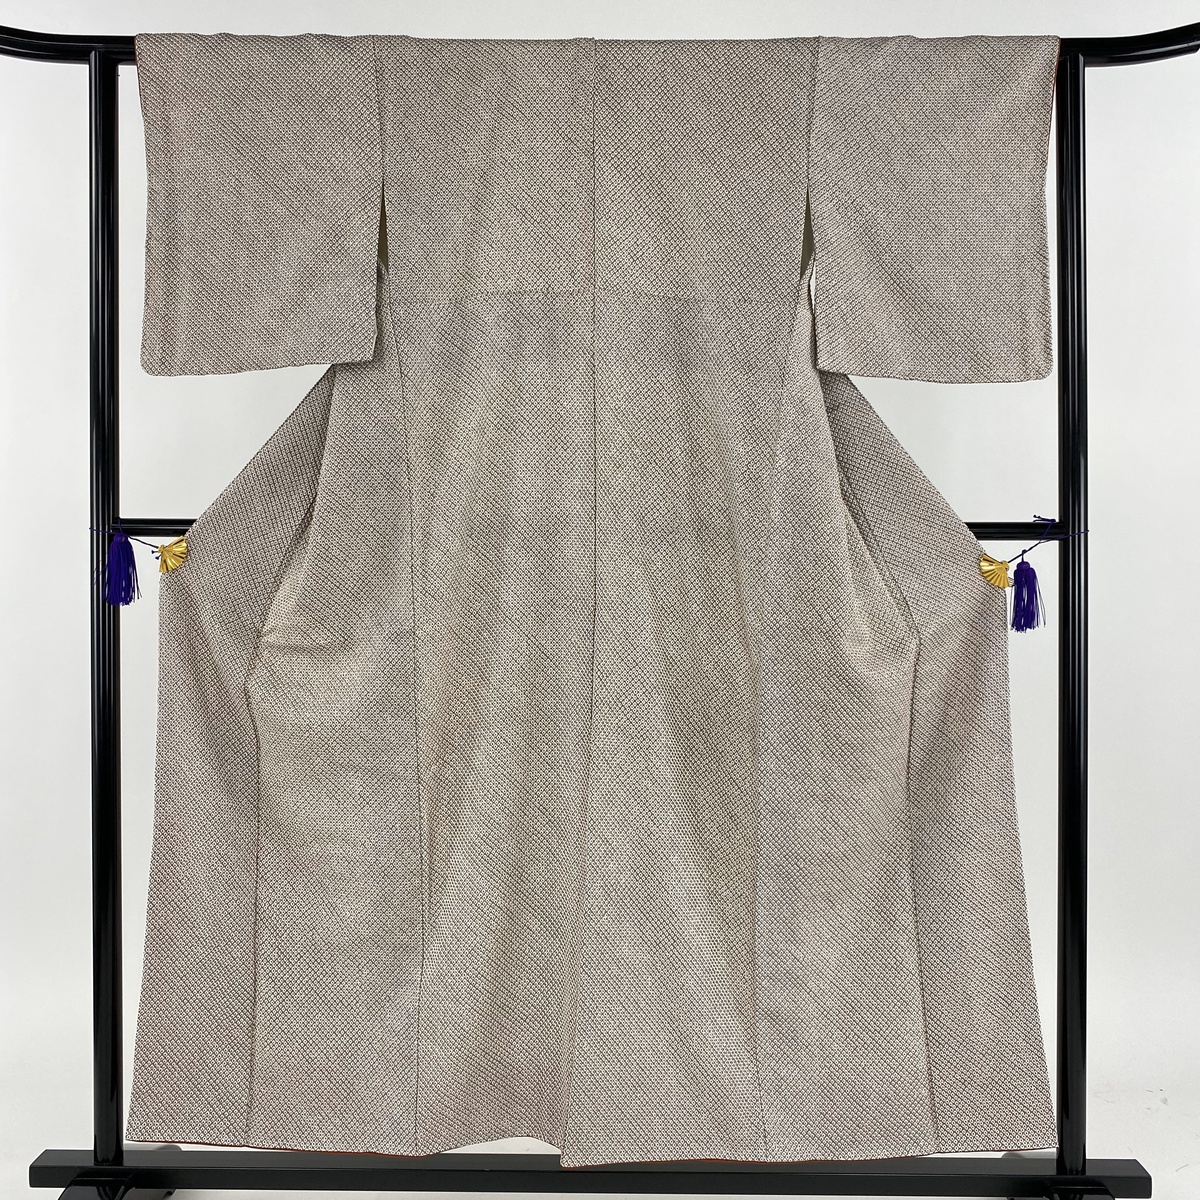 小紋 美品 秀品 総絞り 灰茶 袷 身丈155cm 裄丈62cm S 正絹 【中古】